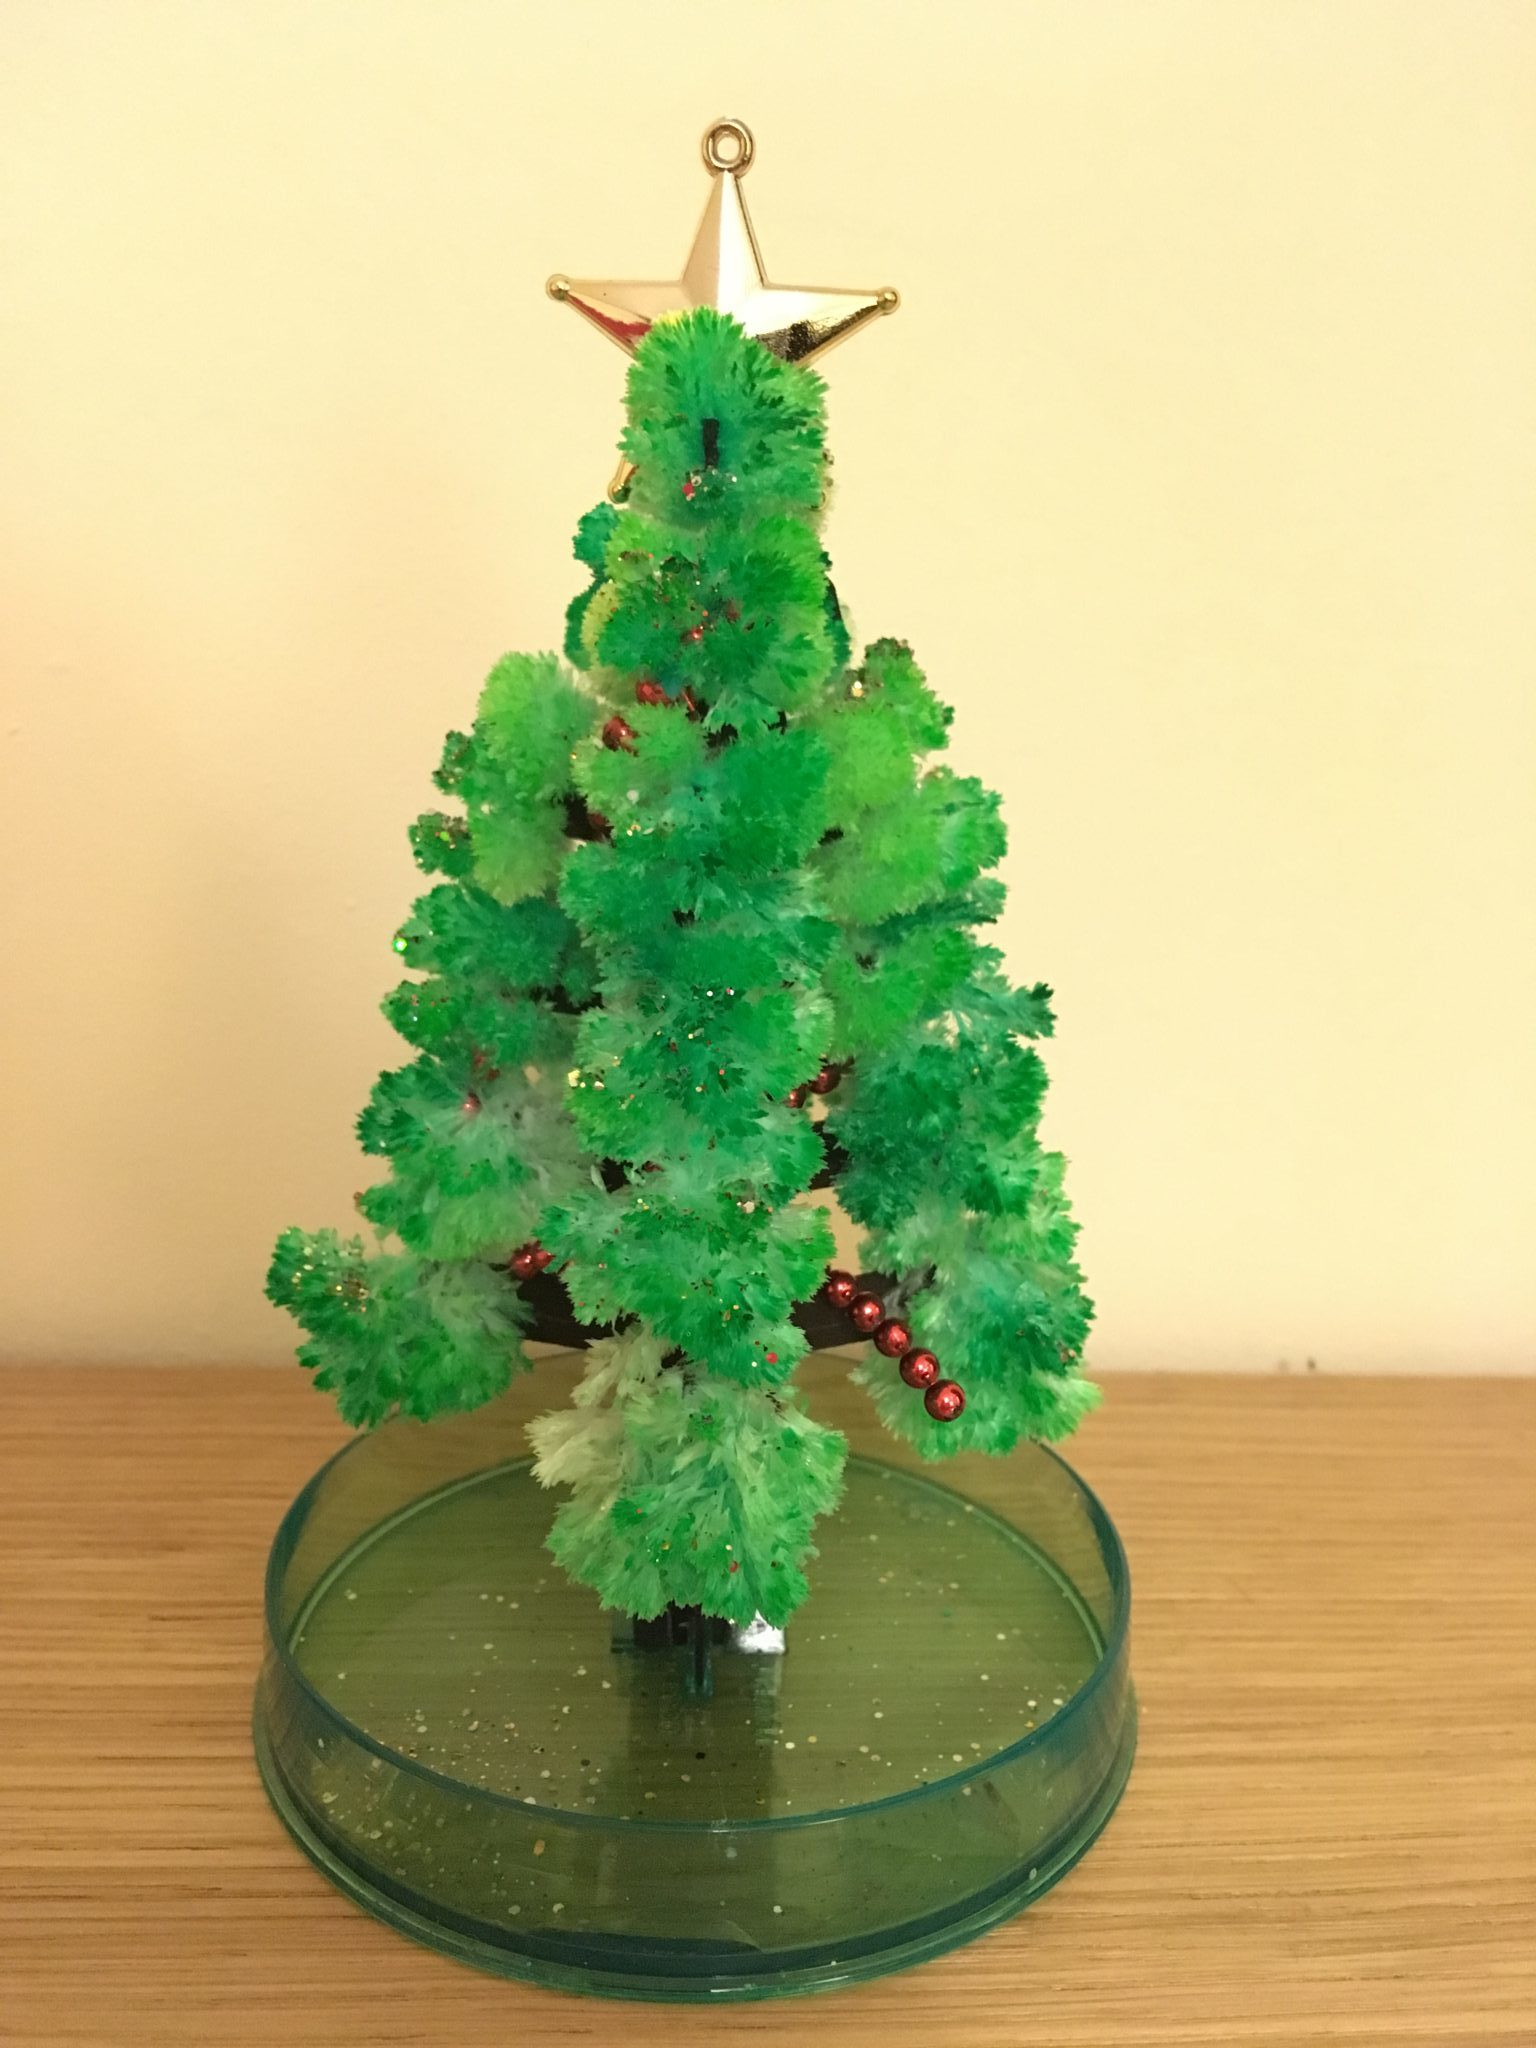 Crystal Growing Christmas Tree Chemistry - Easternblot